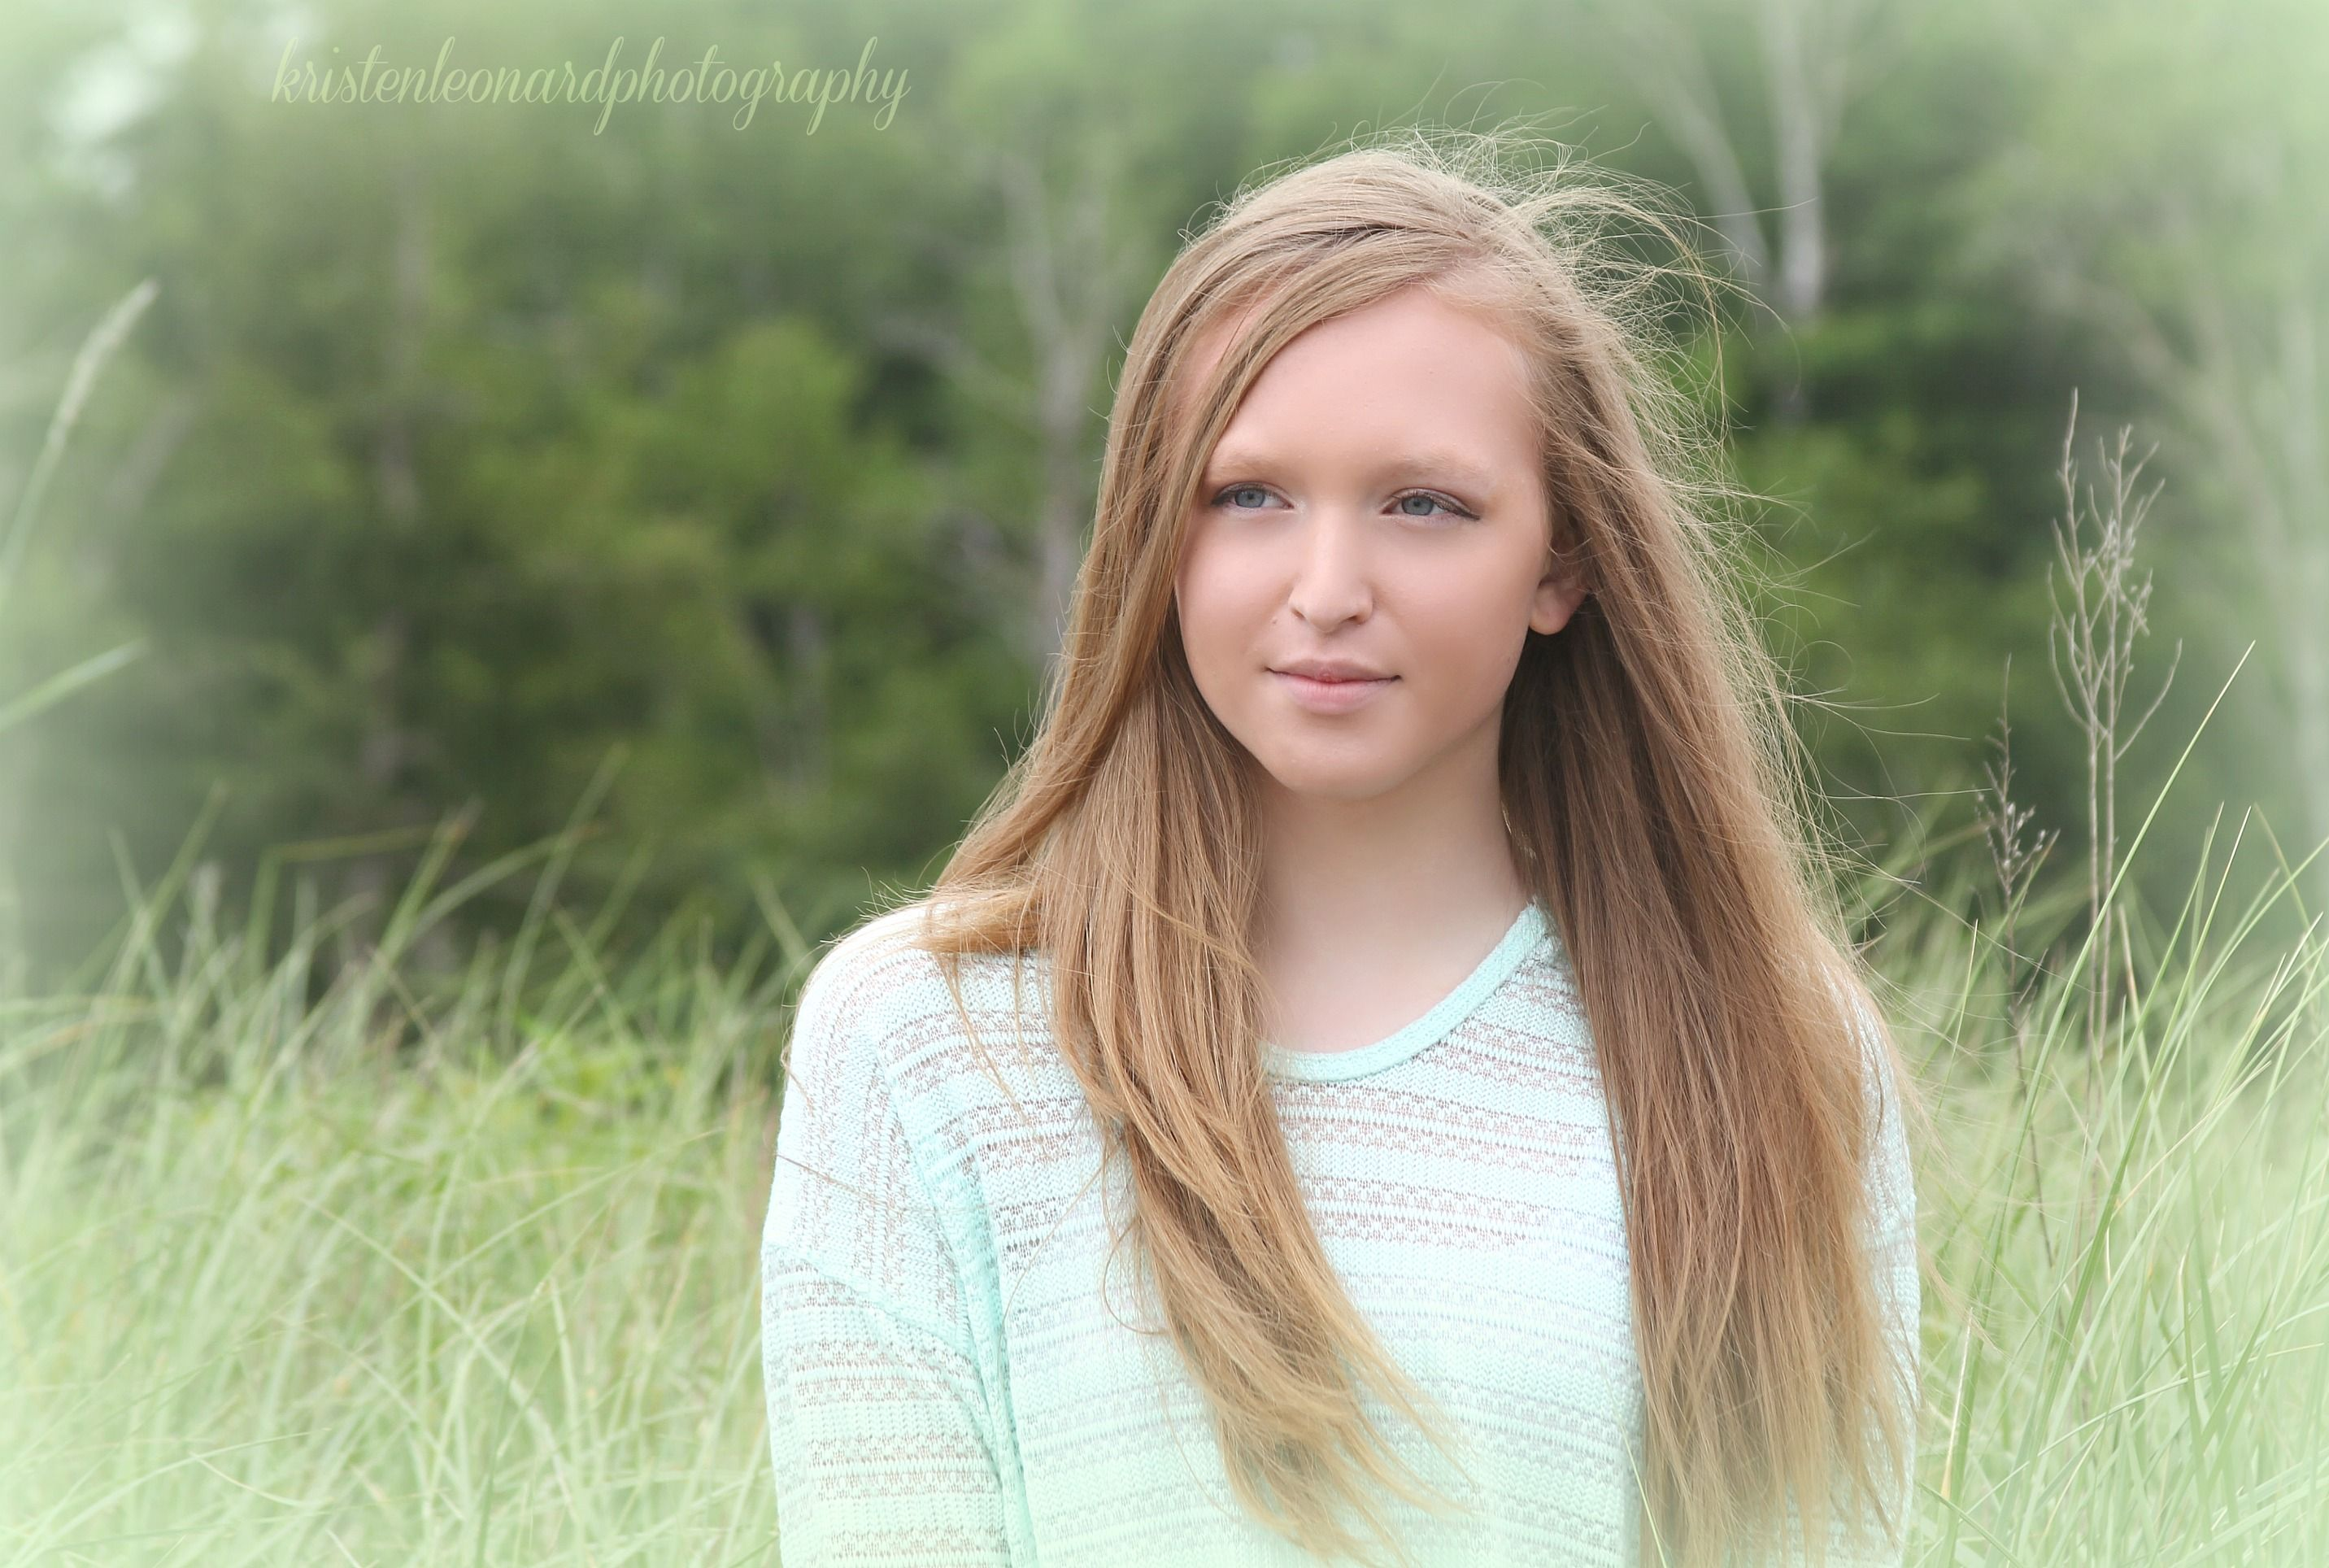 Maine teen portraits Sandy Point Maine Kristen Leonard